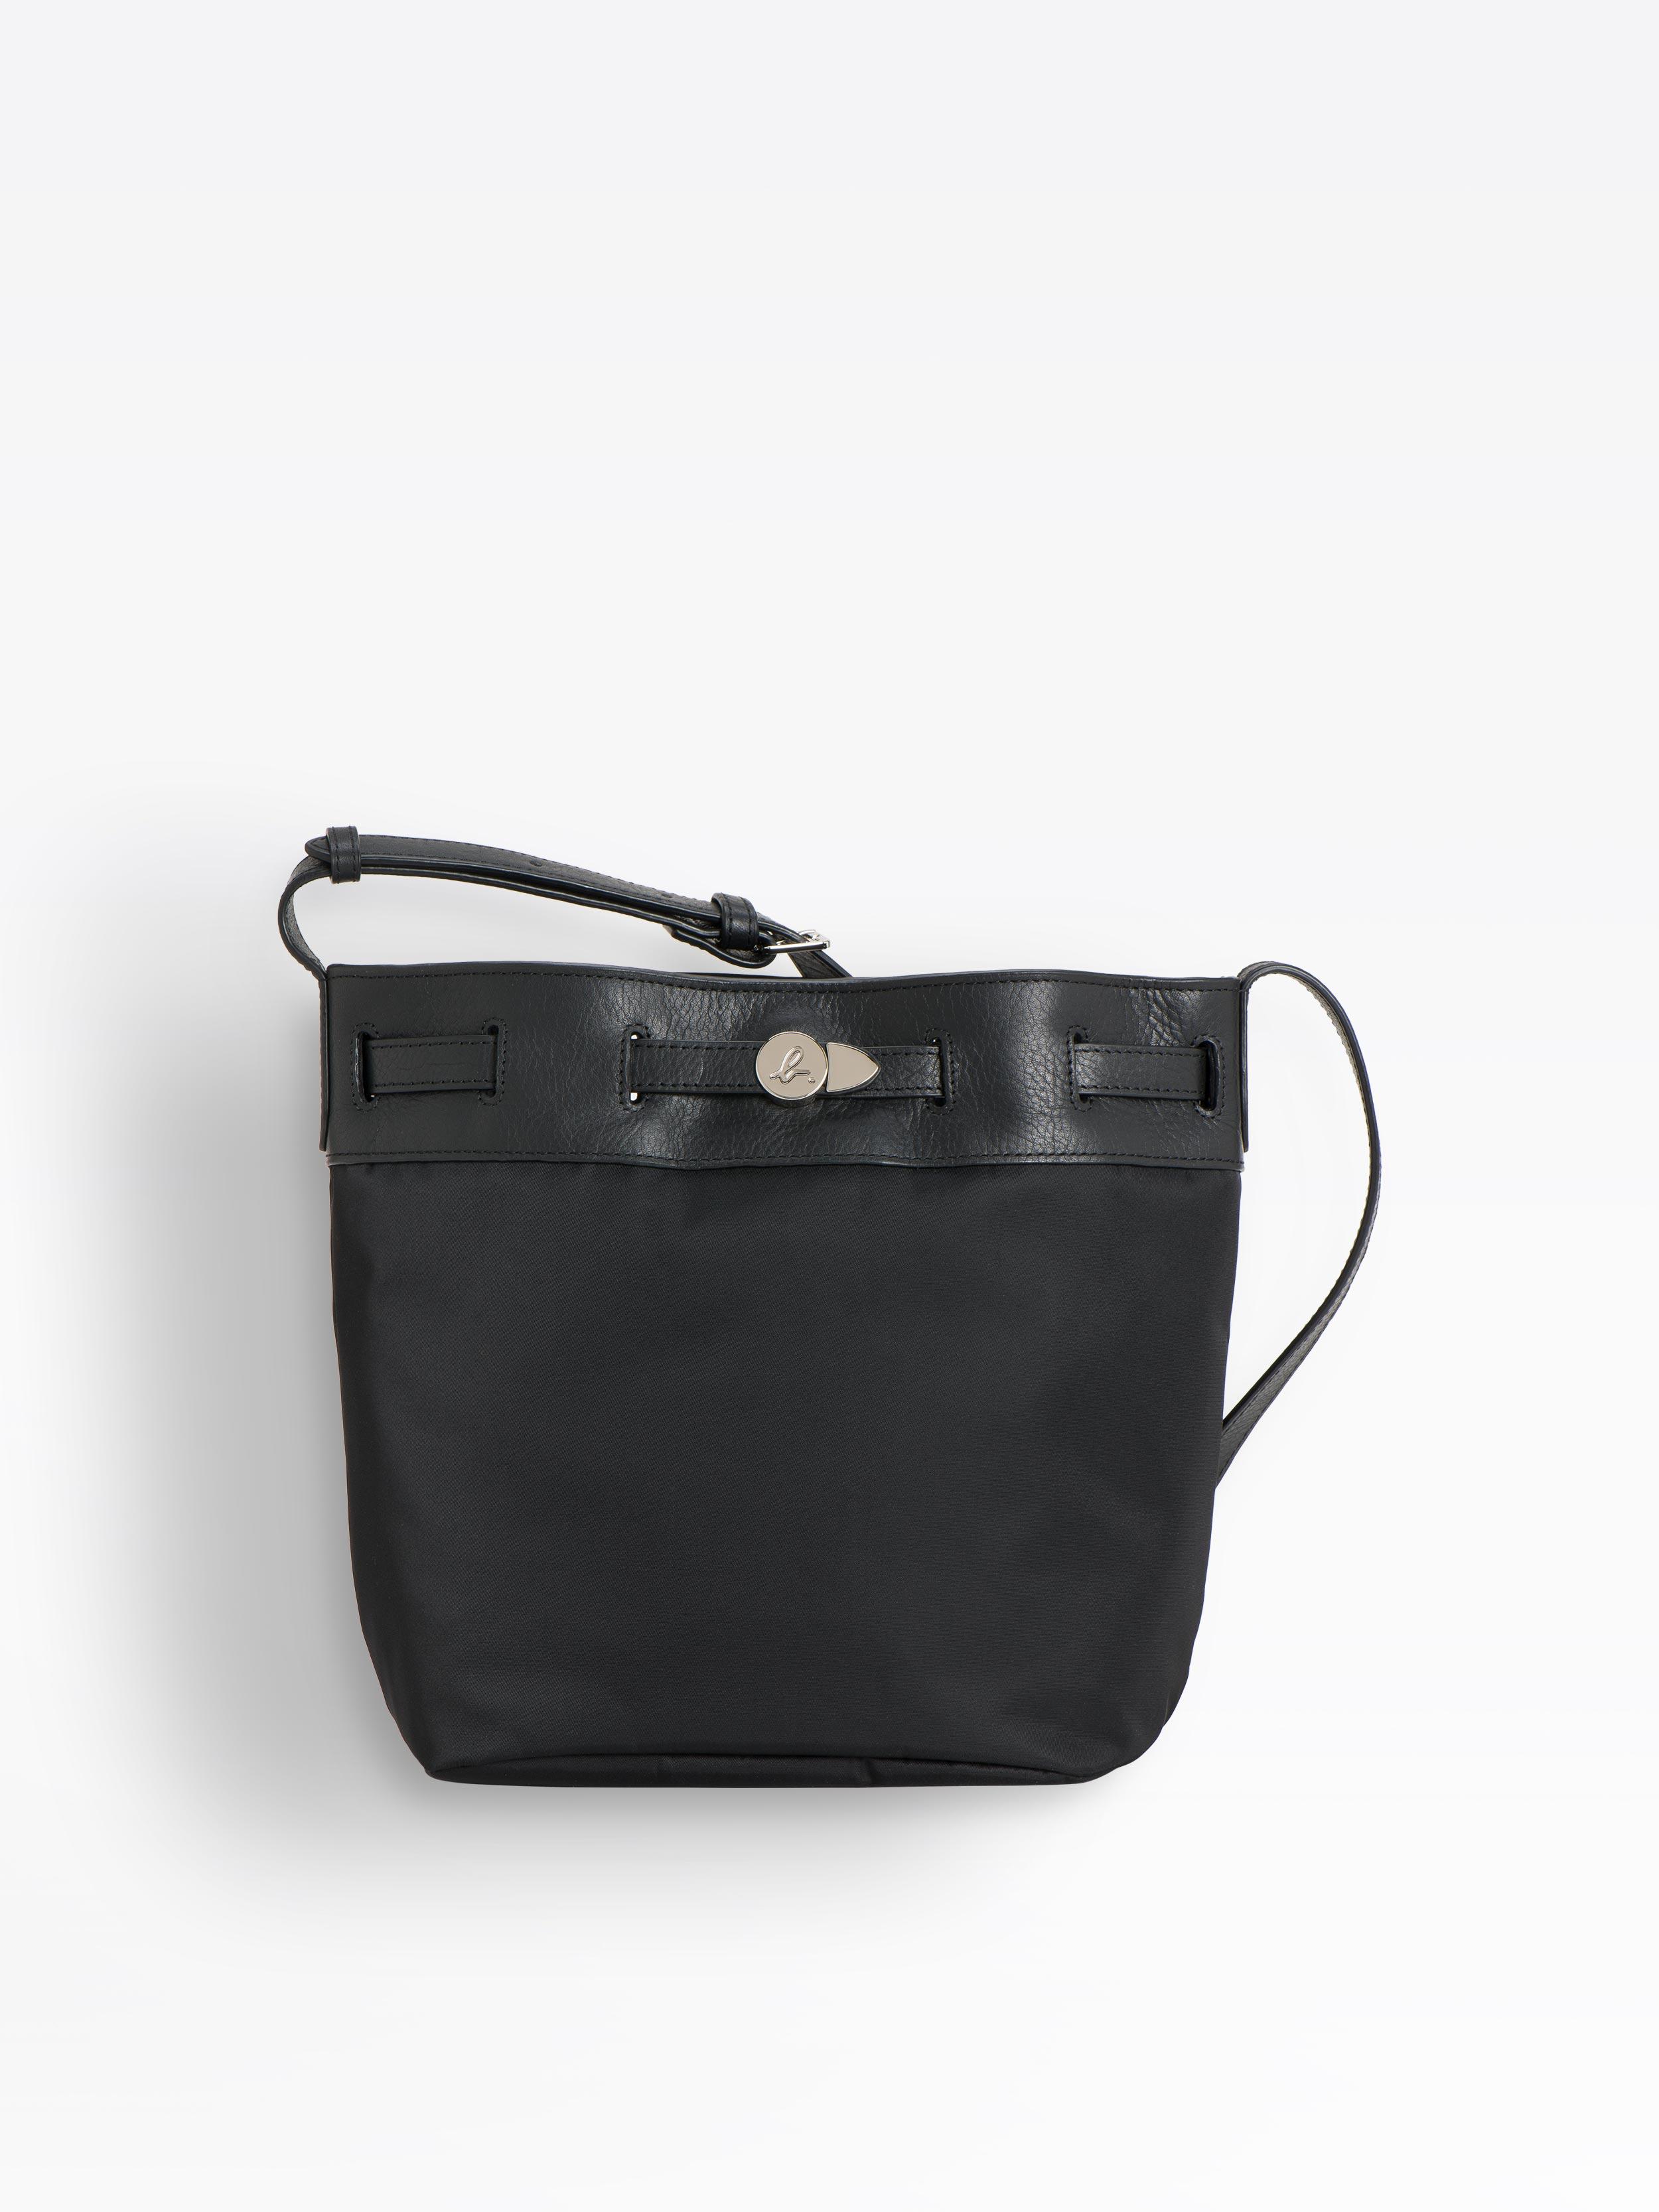 Black Nylon And Leather Bucket Bag